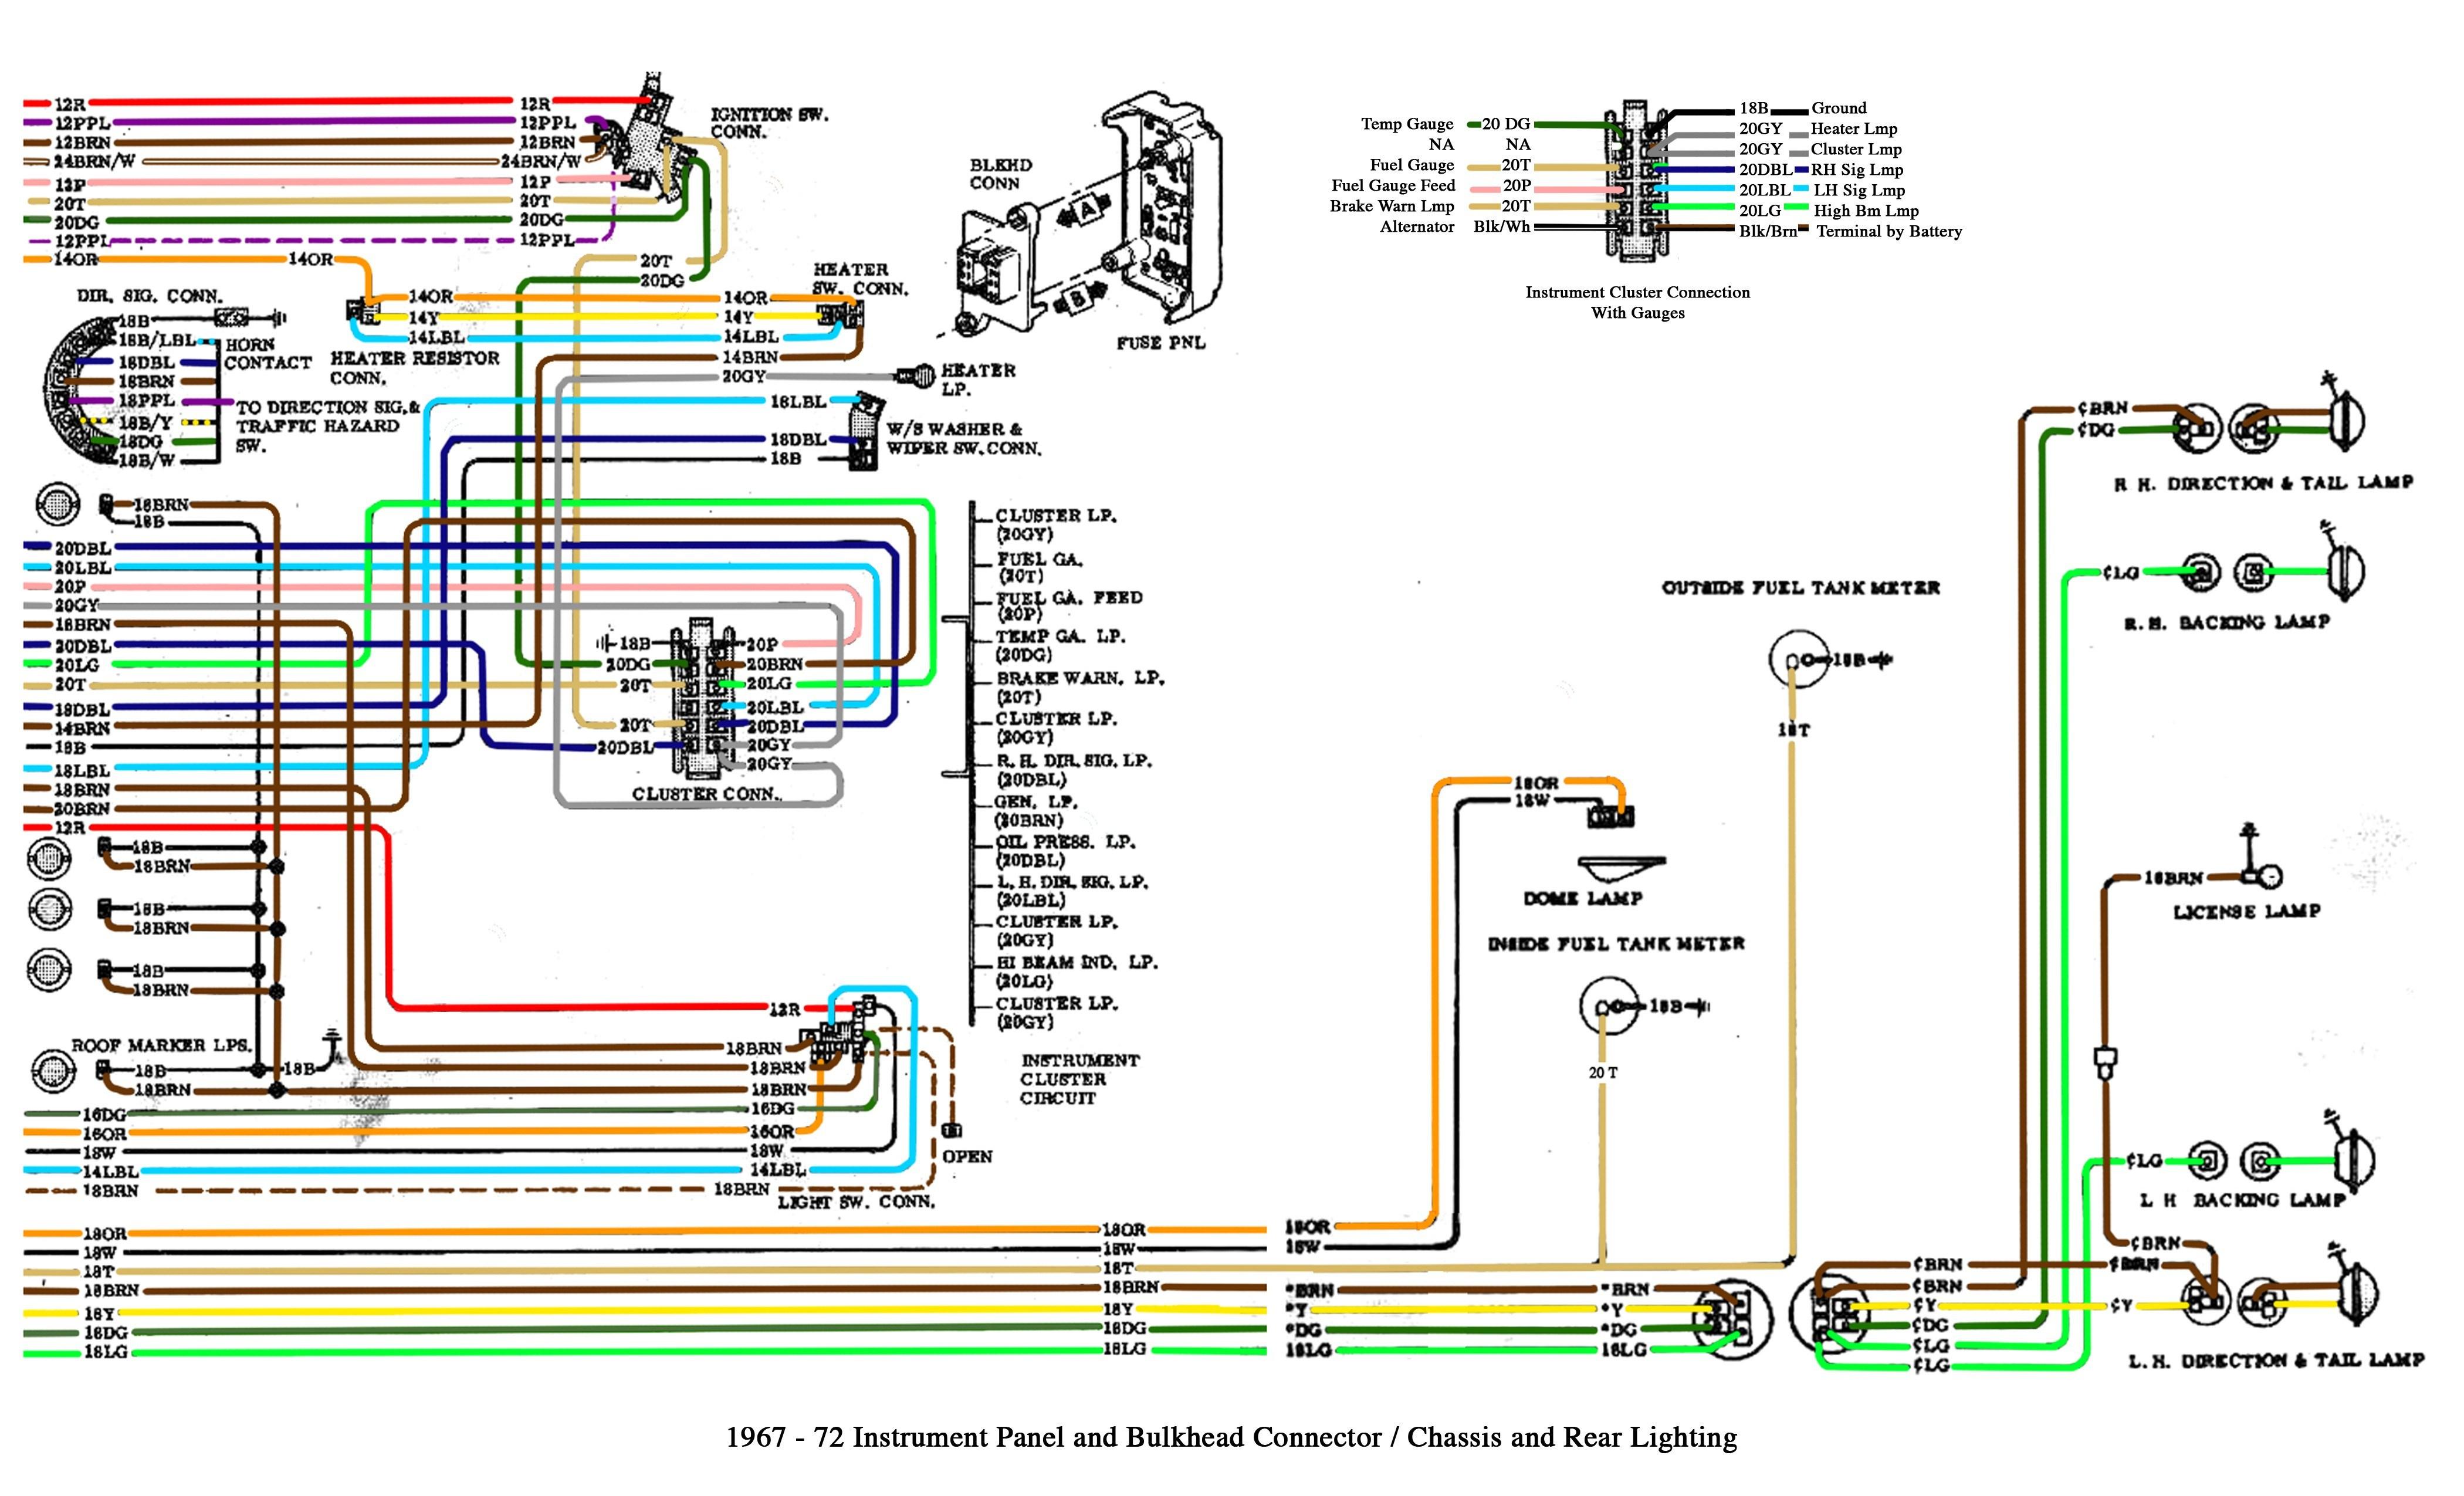 2011 Tacoma Rear Tail Light Wiring Diagram